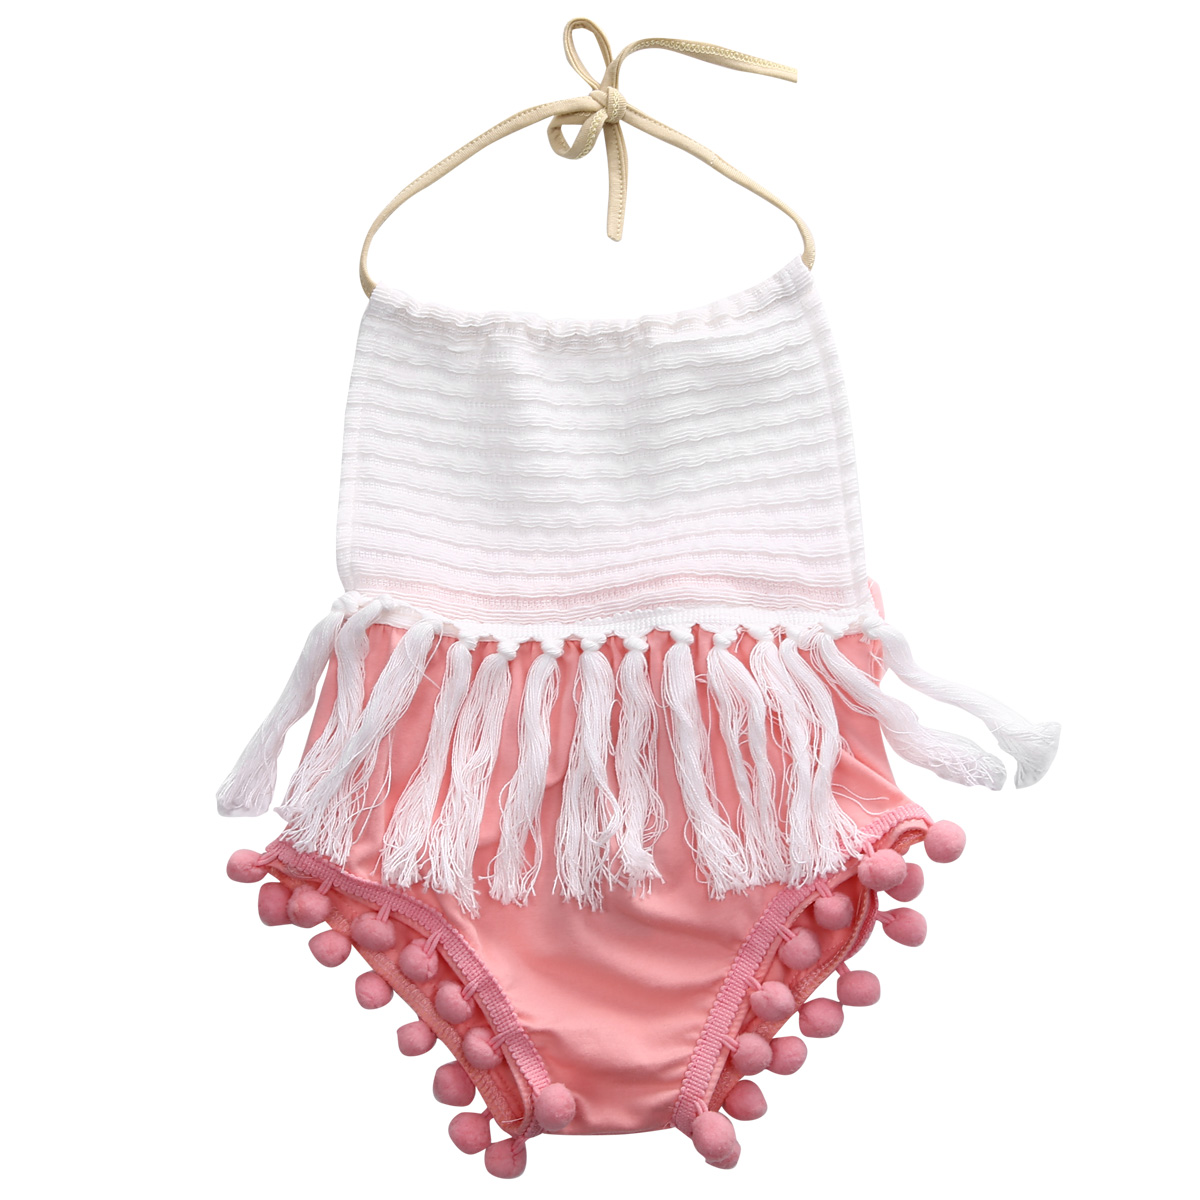 Fashion 2018 Newborn Toddler Baby Girls Patchwork Halter Tassels Strap Romper Jumpsuit Outfit Clothes